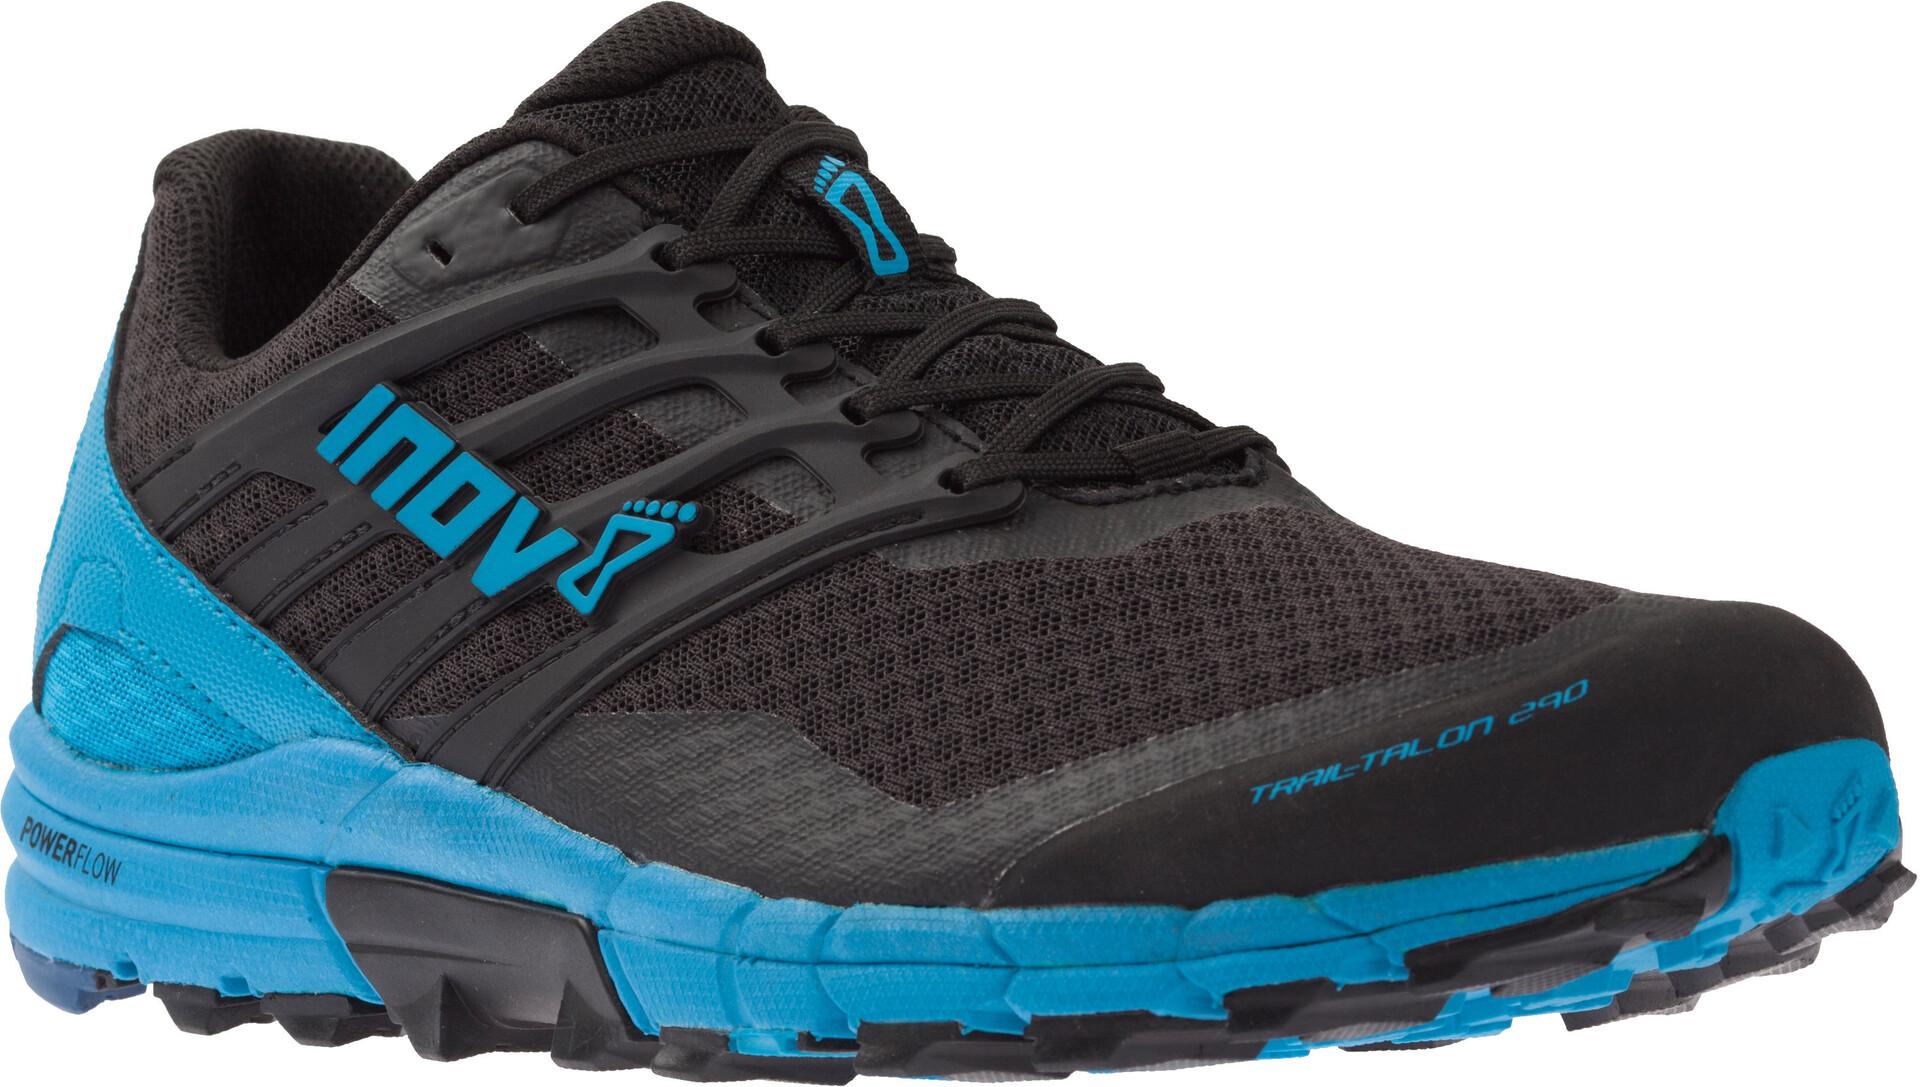 inov-8 Trail Talon 290 Shoes Herr black/blue - addnature.com